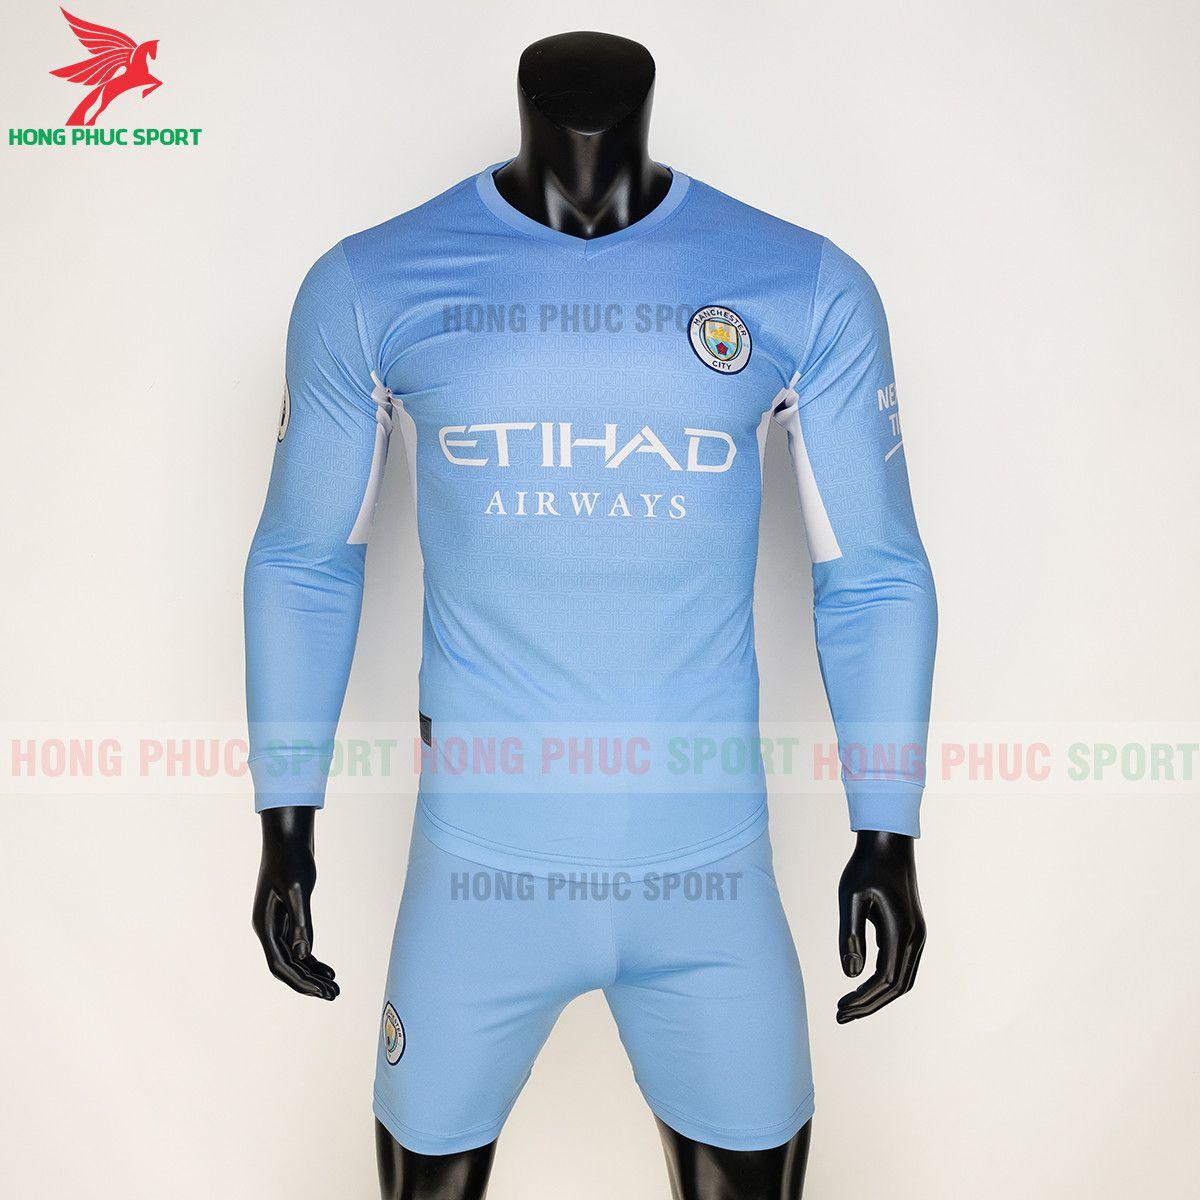 https://cdn.hongphucsport.com/unsafe/s4.shopbay.vn/files/285/ao-bong-da-man-city-dai-tay-2021-22-san-nha-thun-lanh-6-615d50a274295.jpg